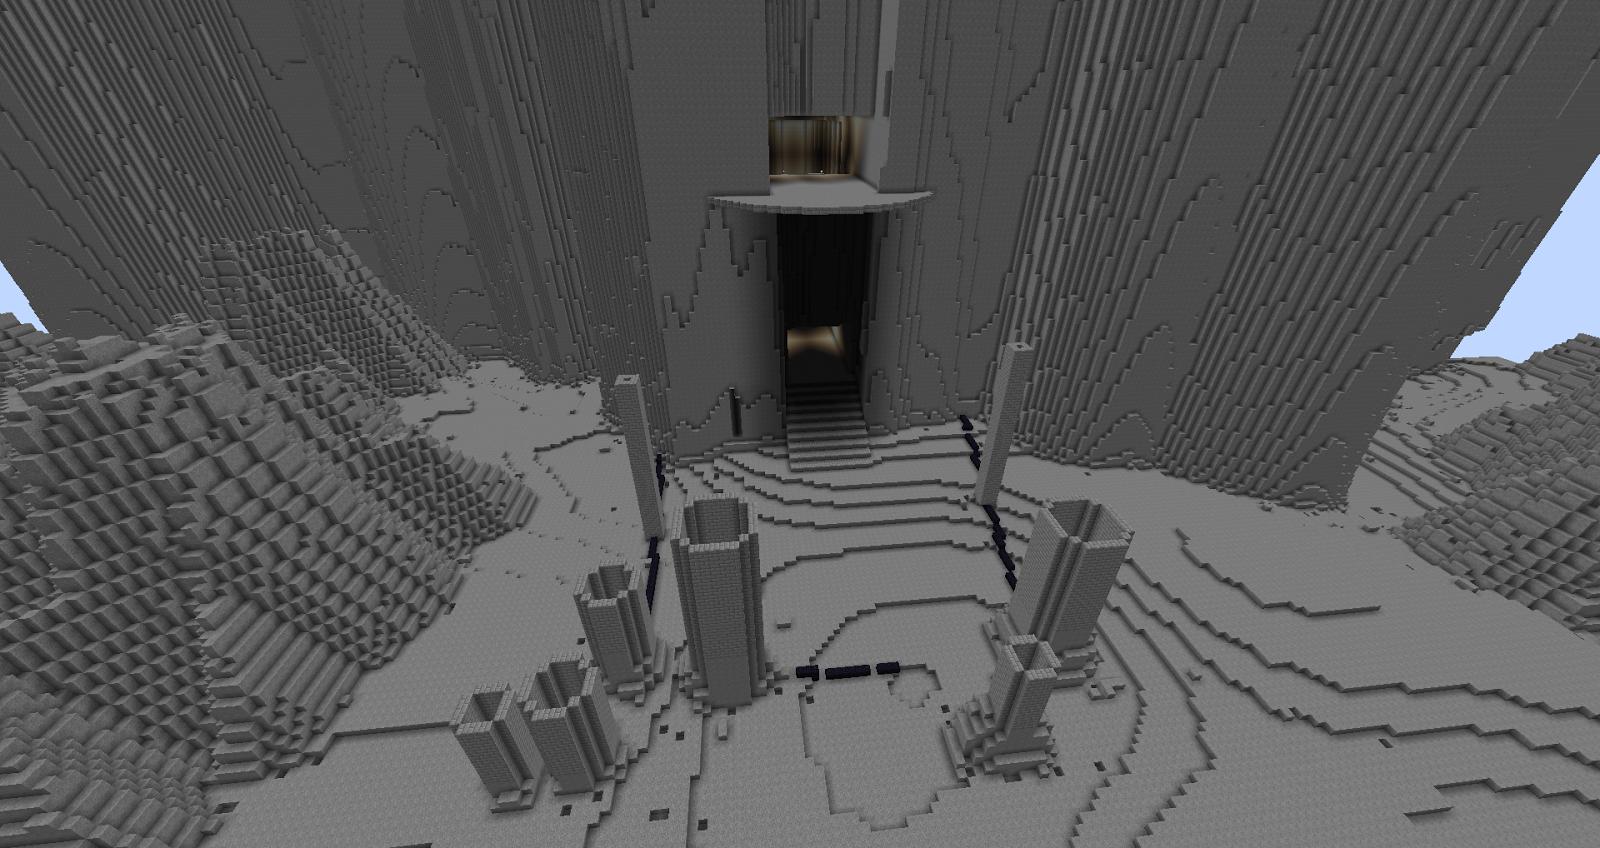 Minecraft Menzoberranzan - City of the Blocky-Drow